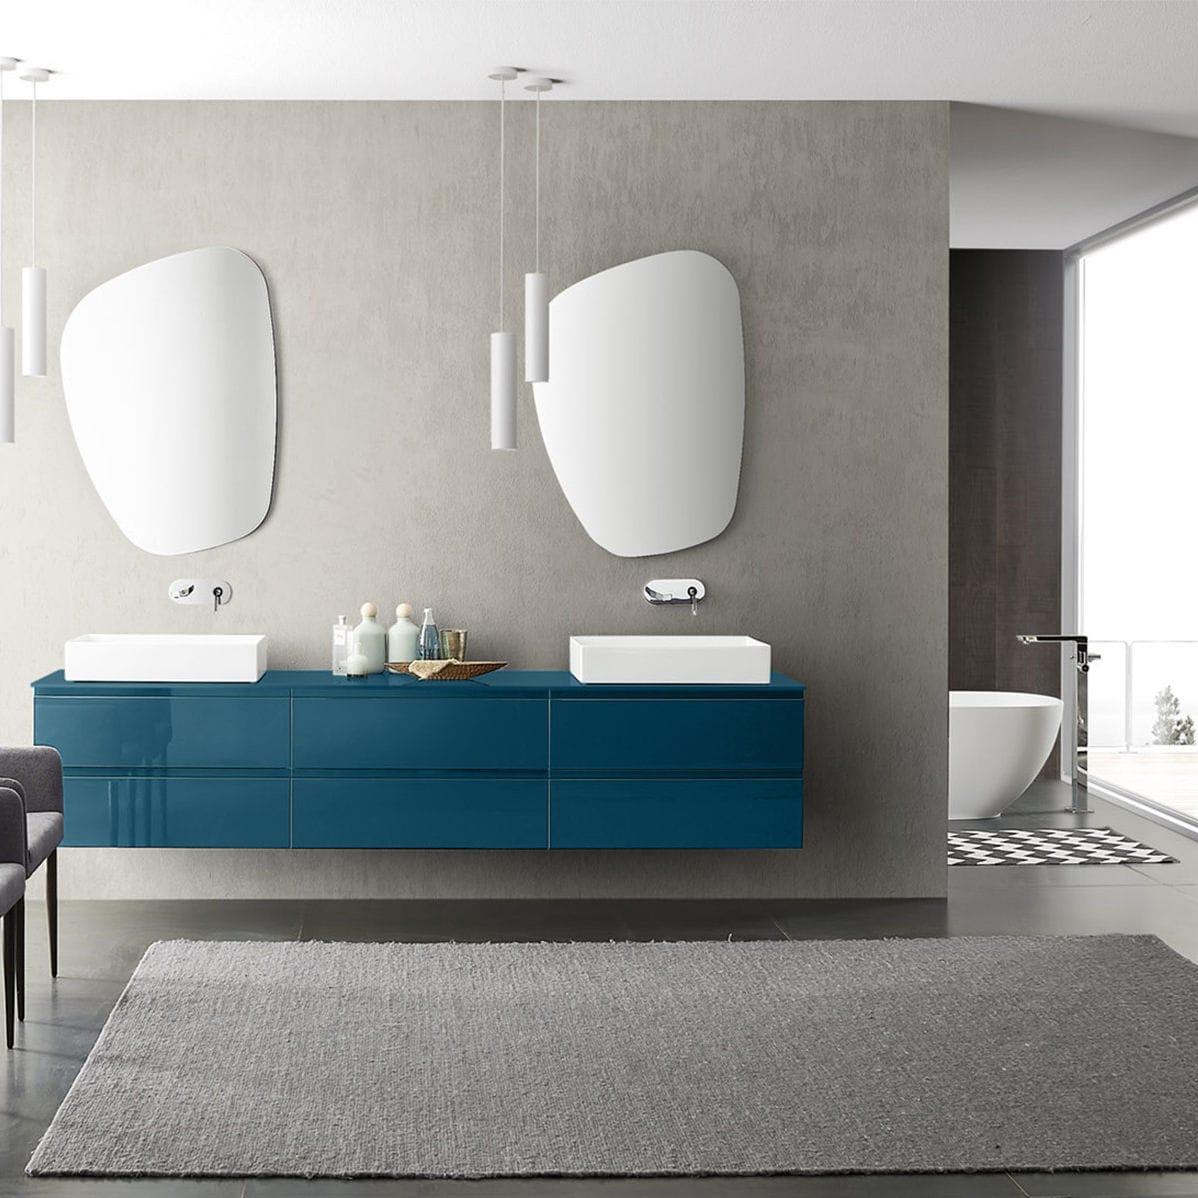 Contemporary bathroom / ceramic / wooden / melamine - COMPOSIZIONE ...